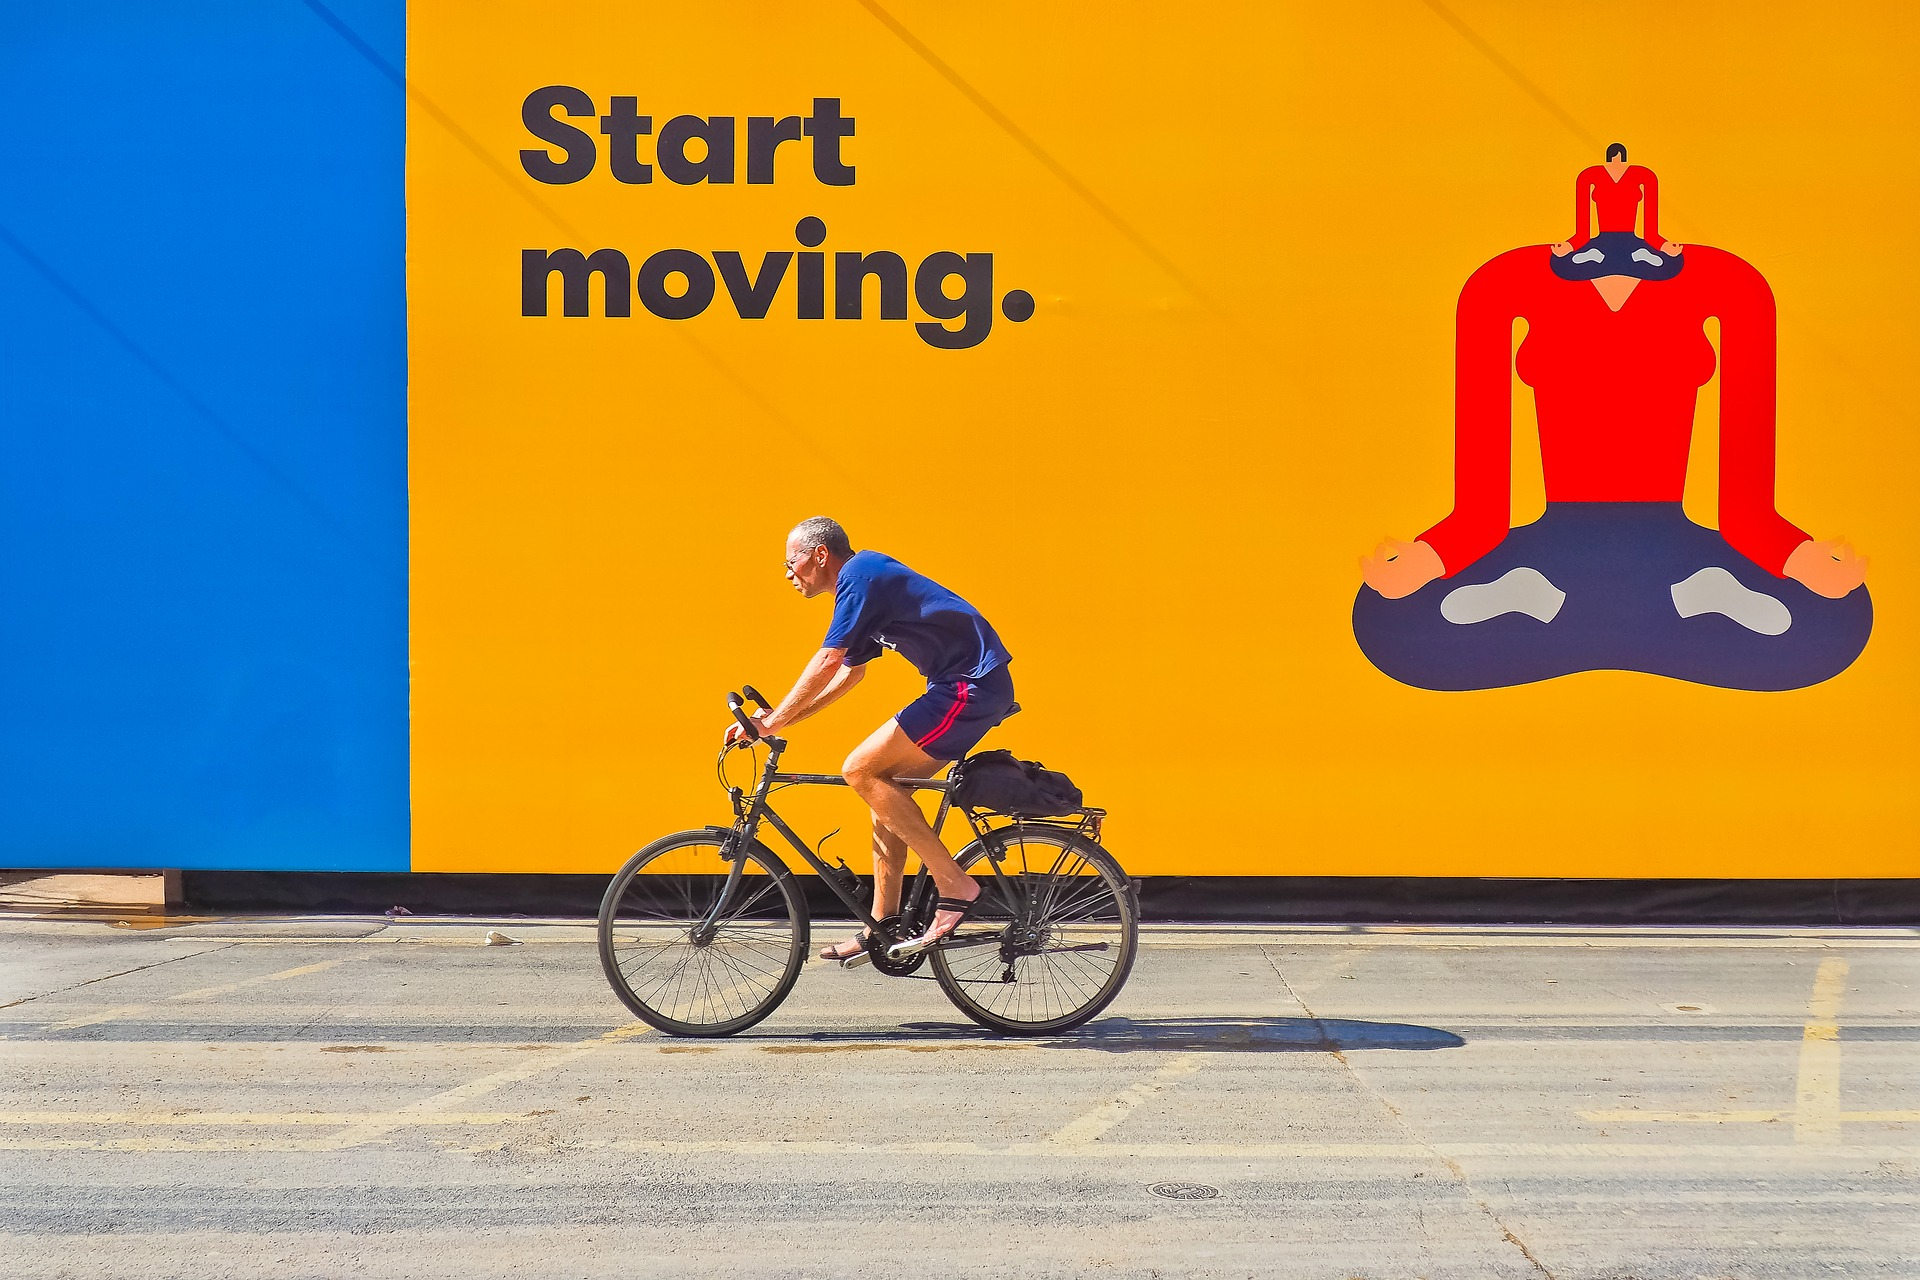 cyclists-2651460_1920.jpg